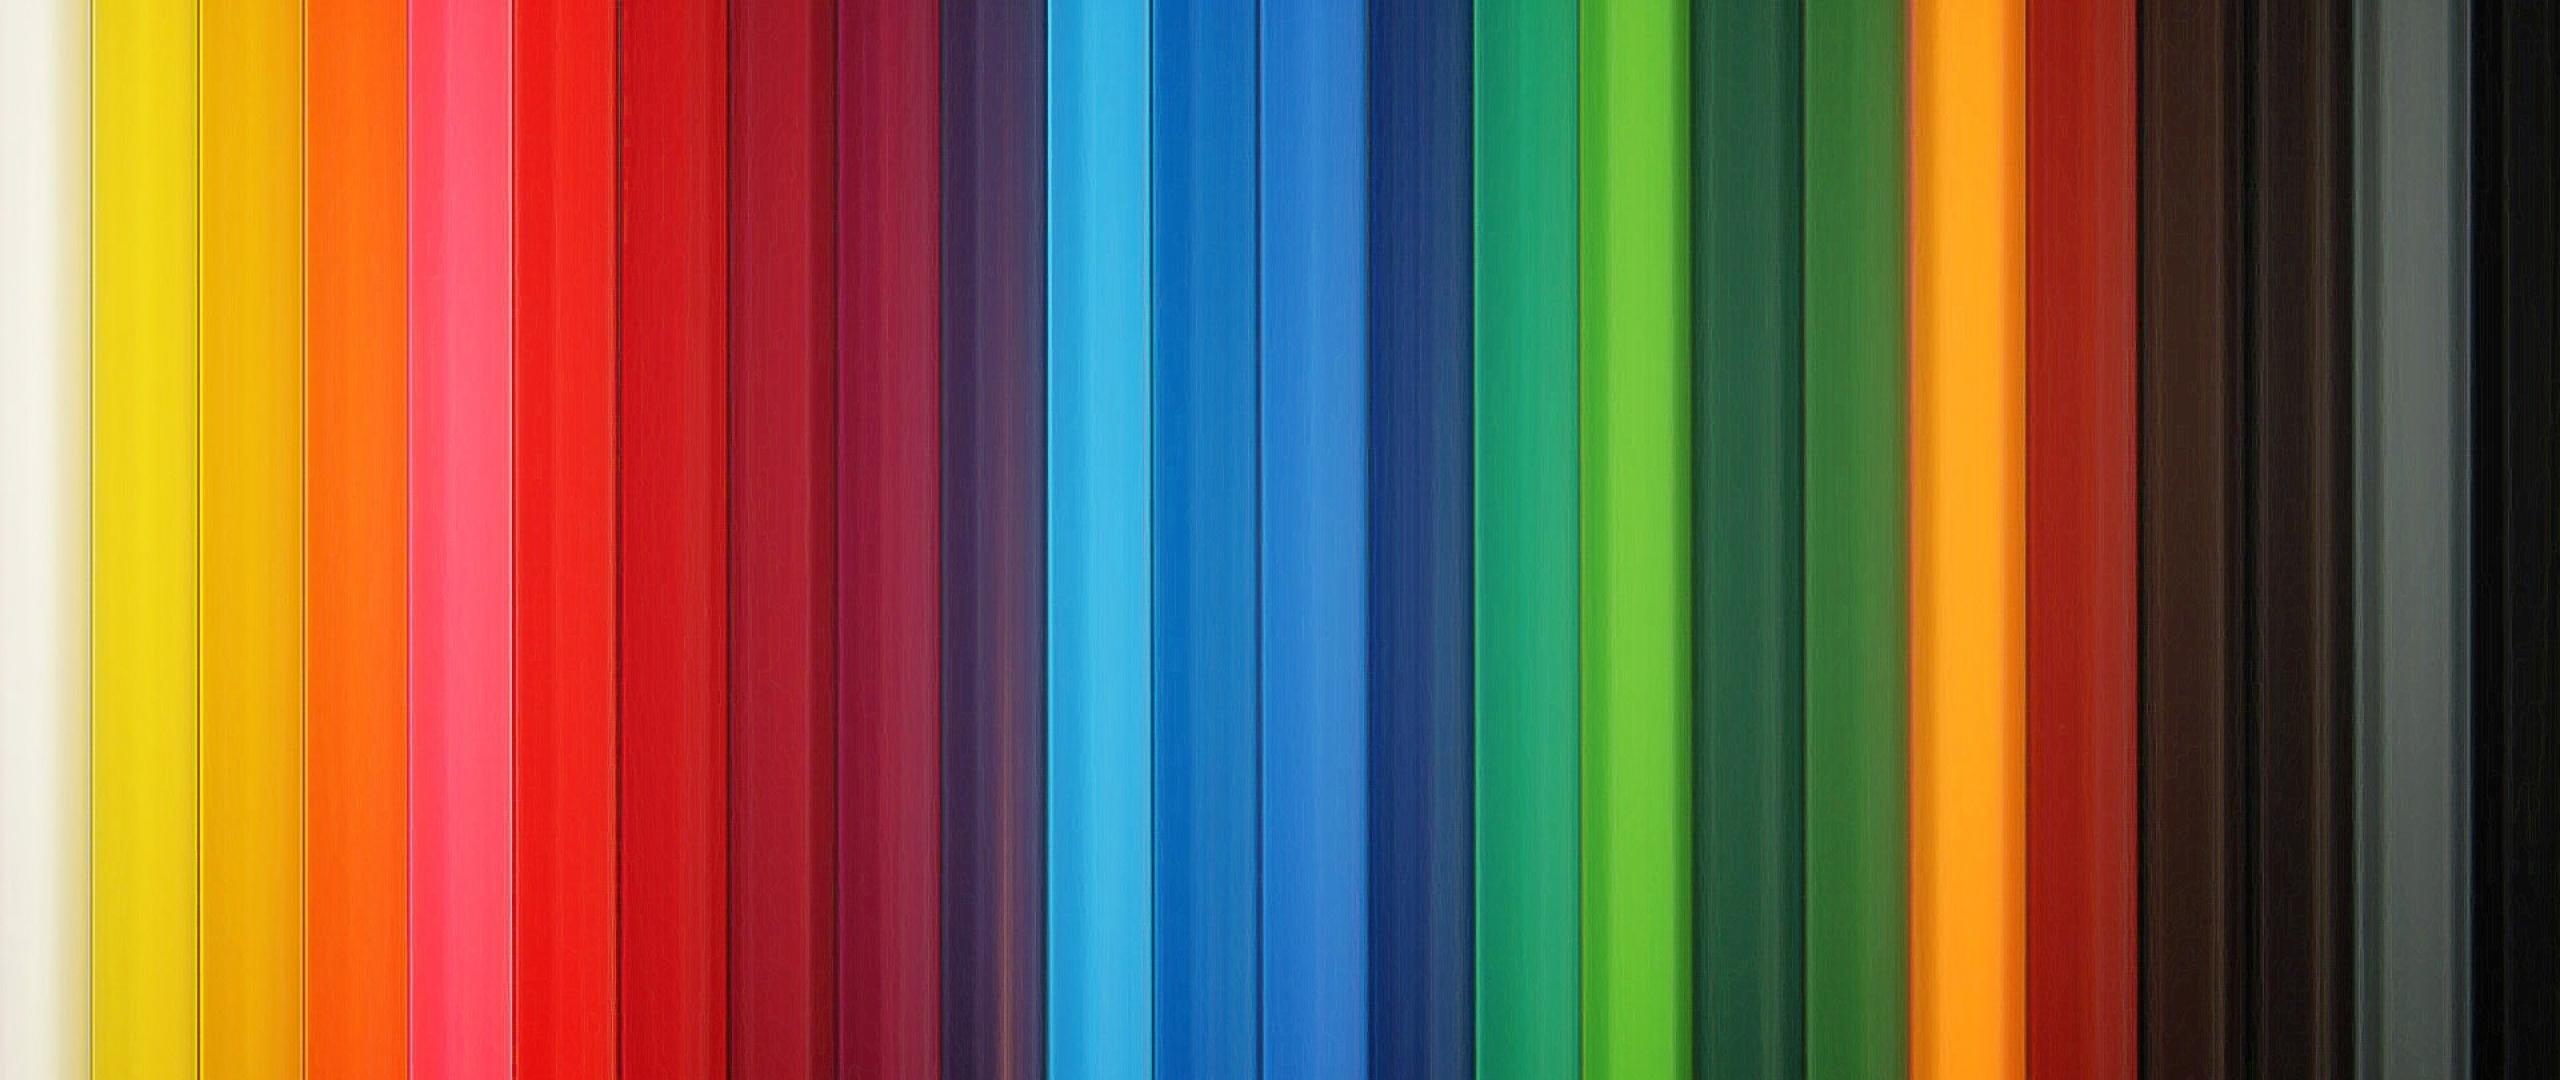 Wallpaper 2560x1080 Colorful Stripes Rainbow Vertical 2560x1080 2560x1080